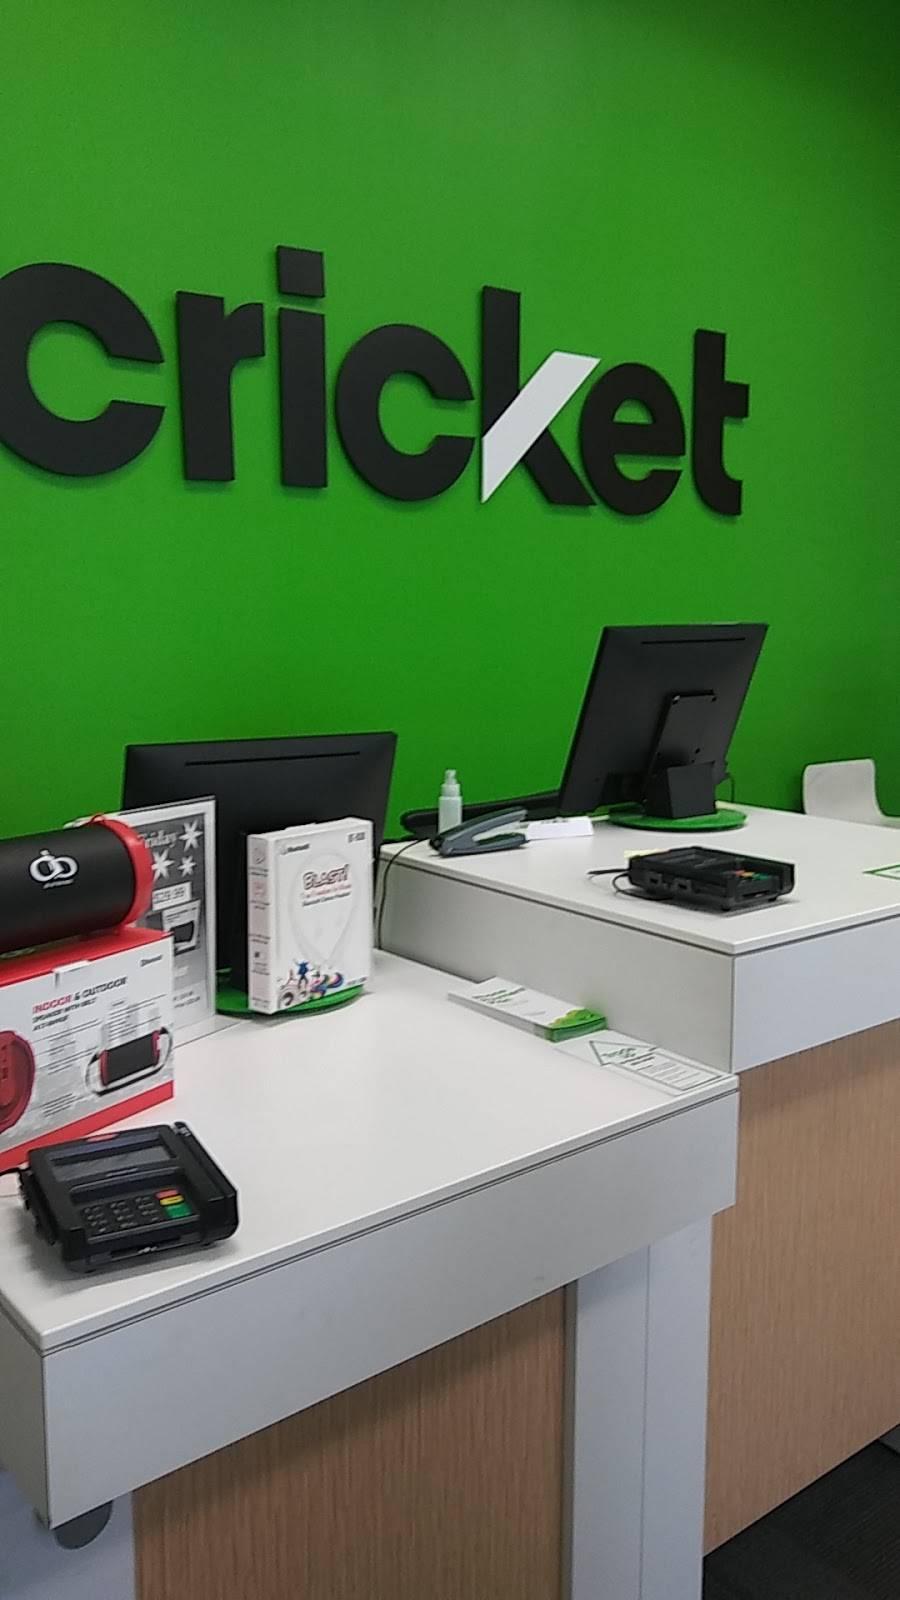 Cricket Wireless Authorized Retailer - store  | Photo 4 of 5 | Address: 5320 TX-359 Ste 101, Laredo, TX 78043, USA | Phone: (956) 722-3401